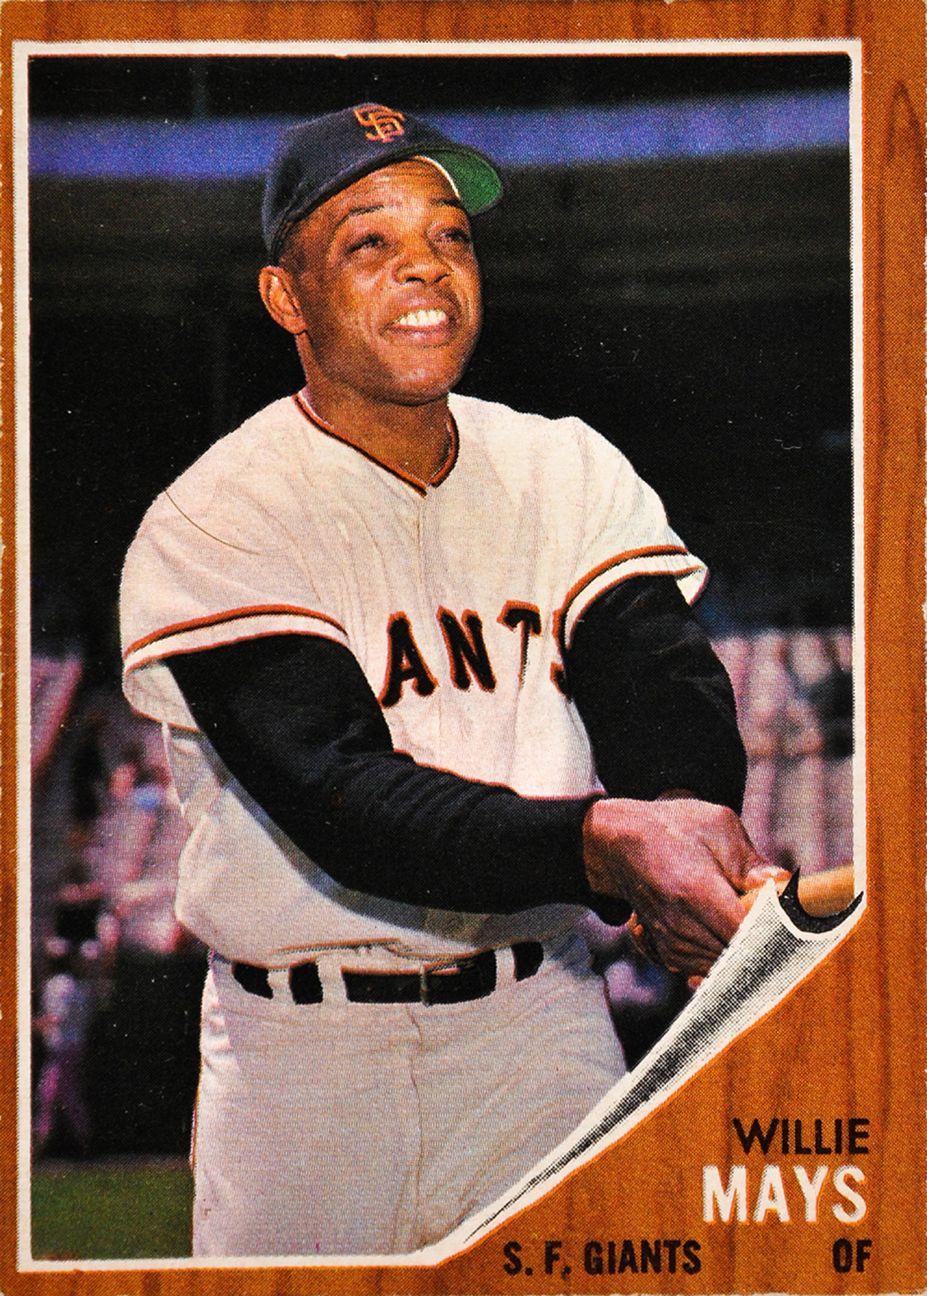 1962 Topps Willie Mays Baseball Cards Baseball Card